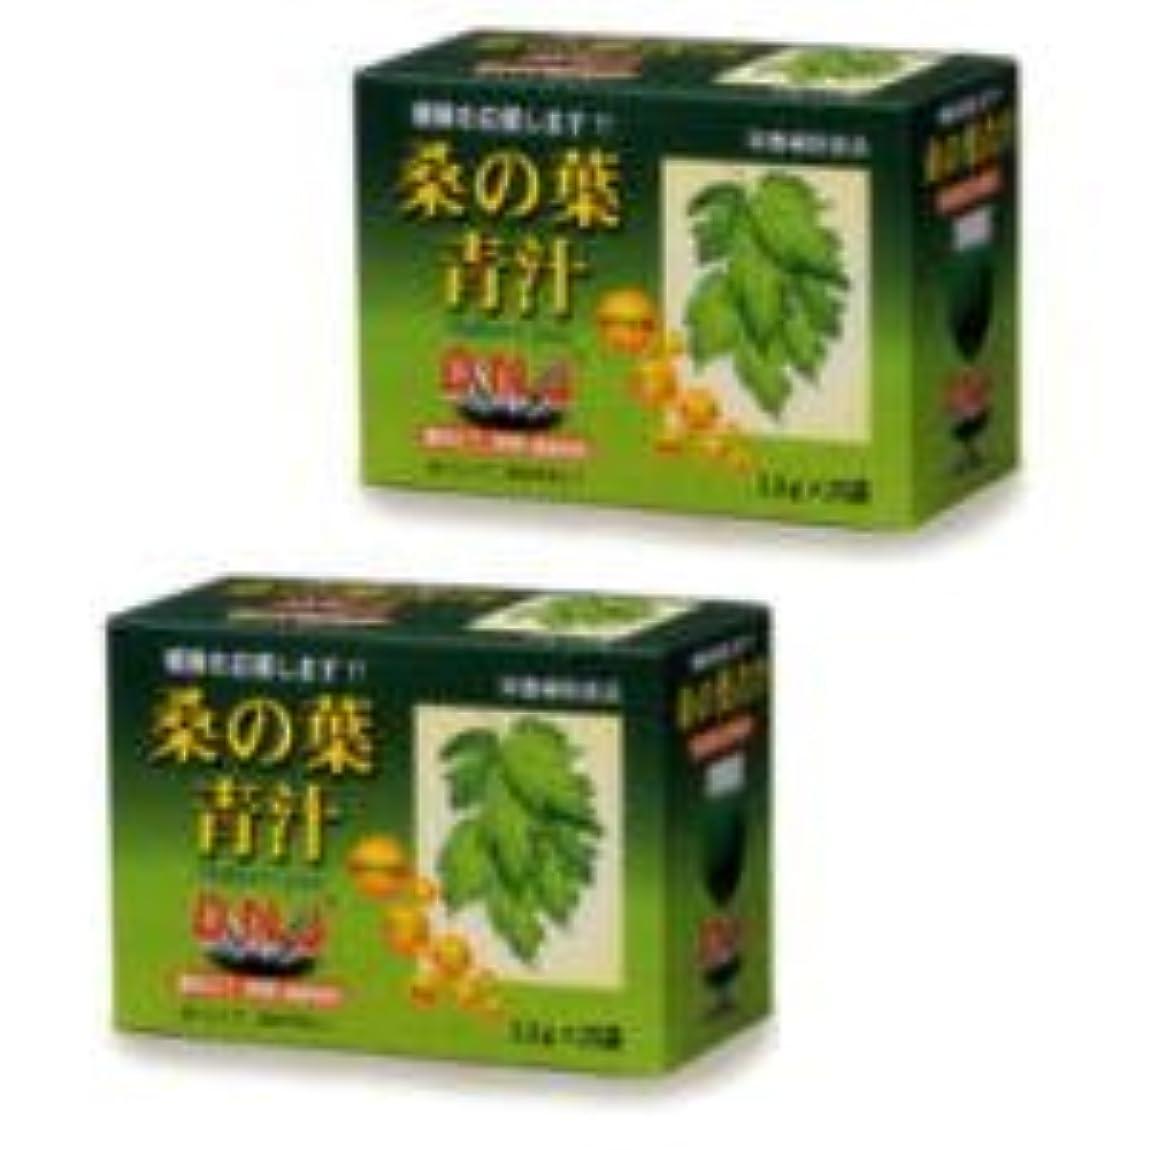 膜秋線桑の葉青汁 2個